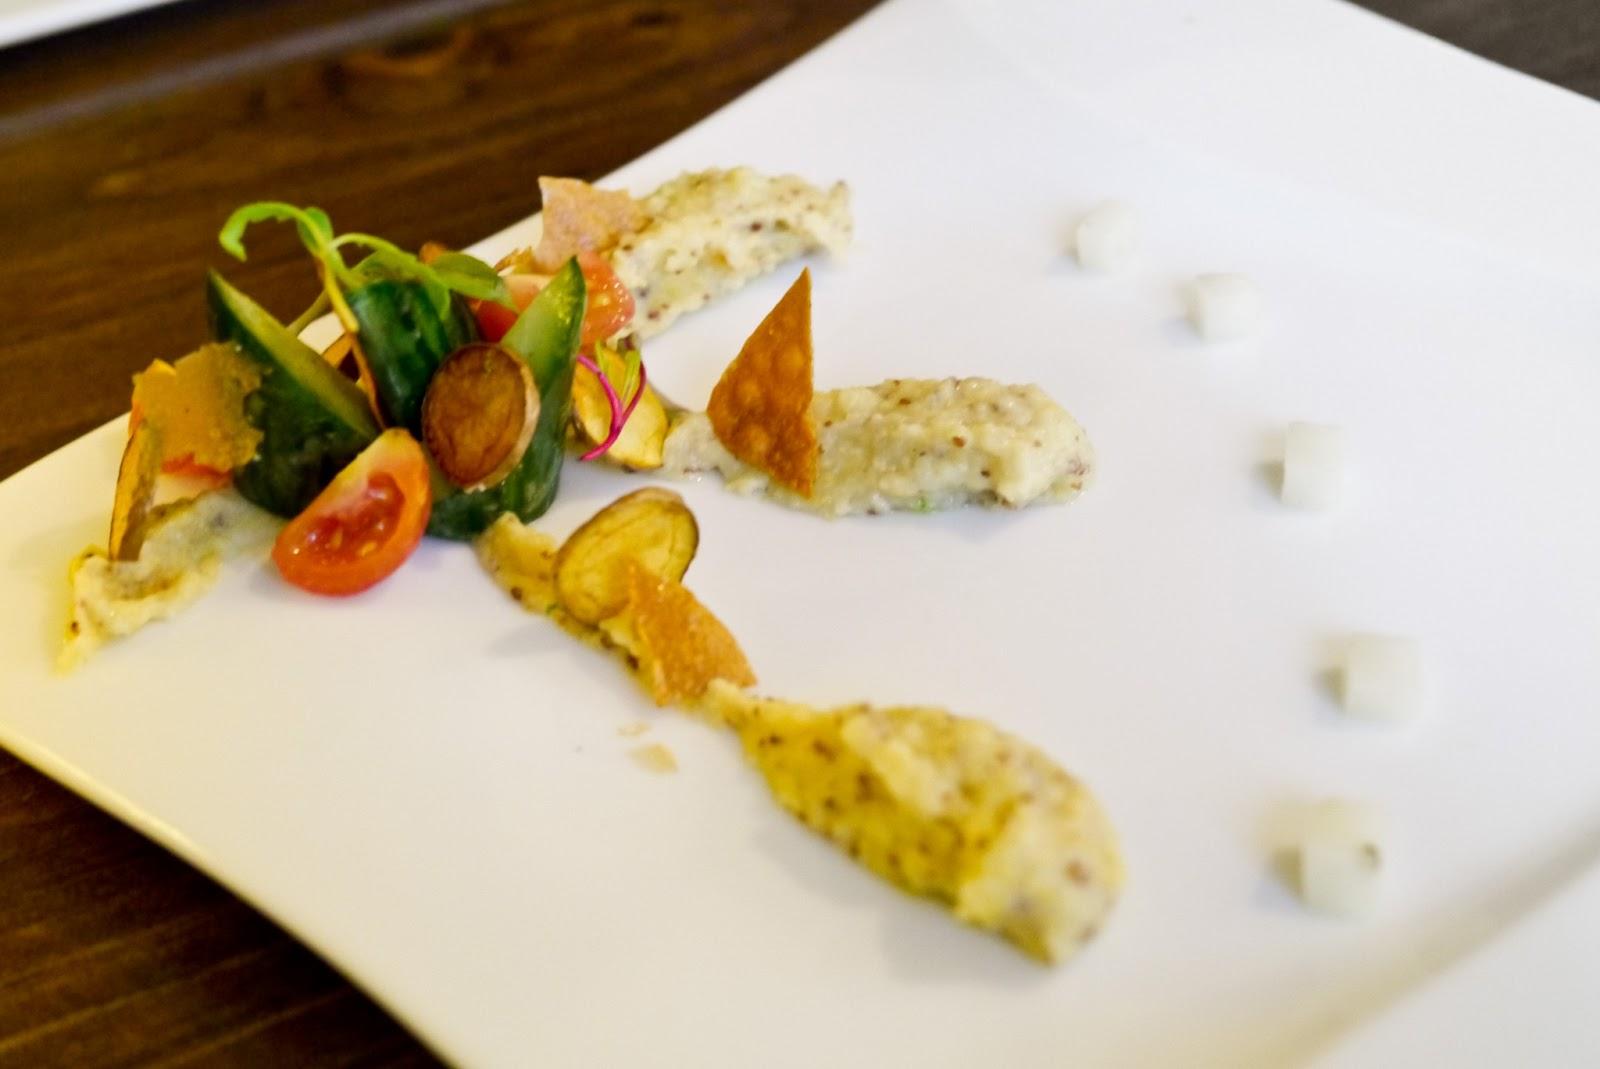 Shrimp And Cucumber Salad With Horseradish Mayo Recipes — Dishmaps